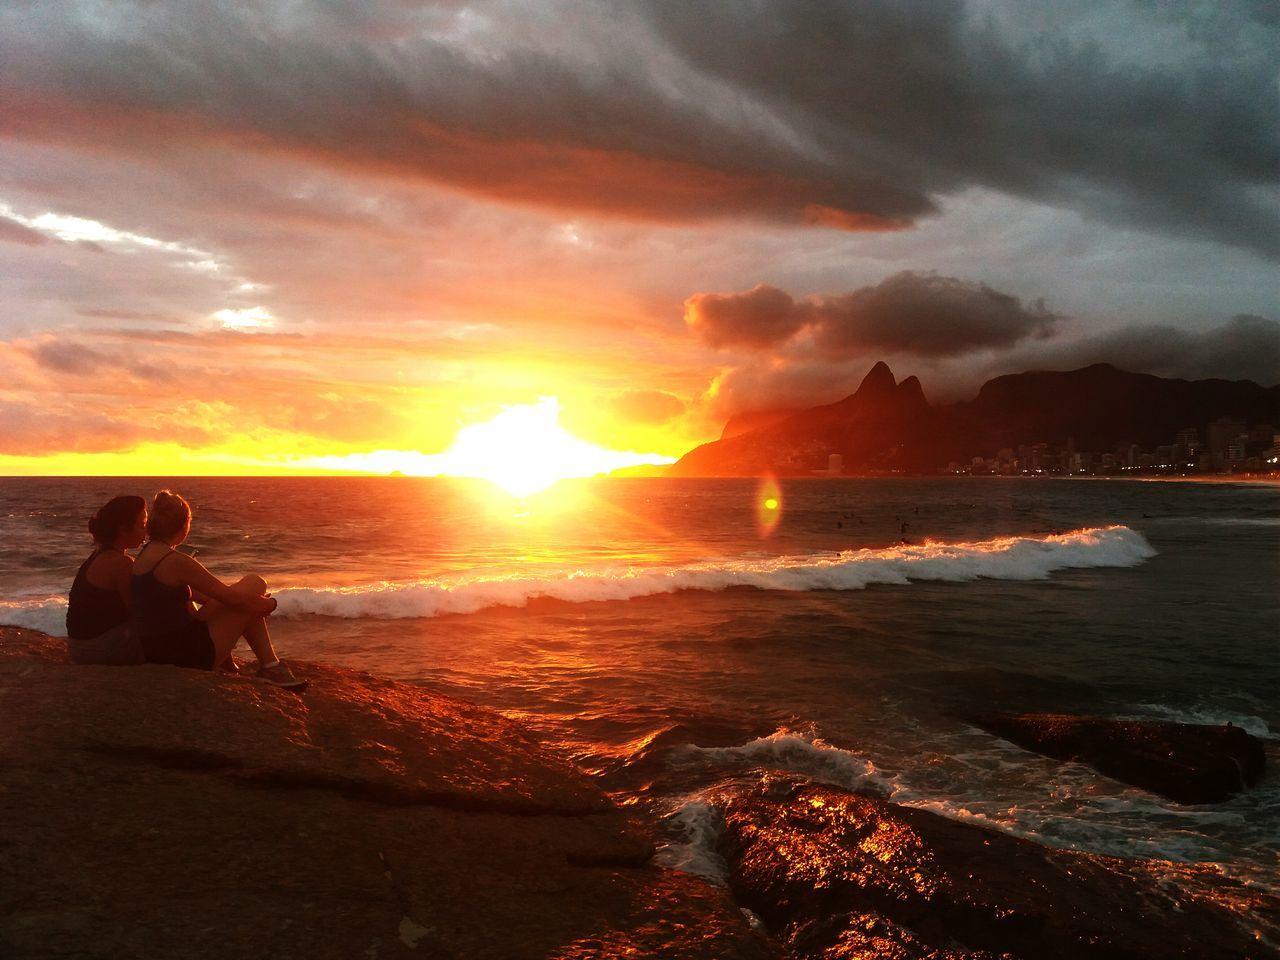 Sea Sun Reflection Beauty In Nature Nature Cloud - Sky Tropical Climate Sunset Ipanema Beach , photo by sansung J5 phone